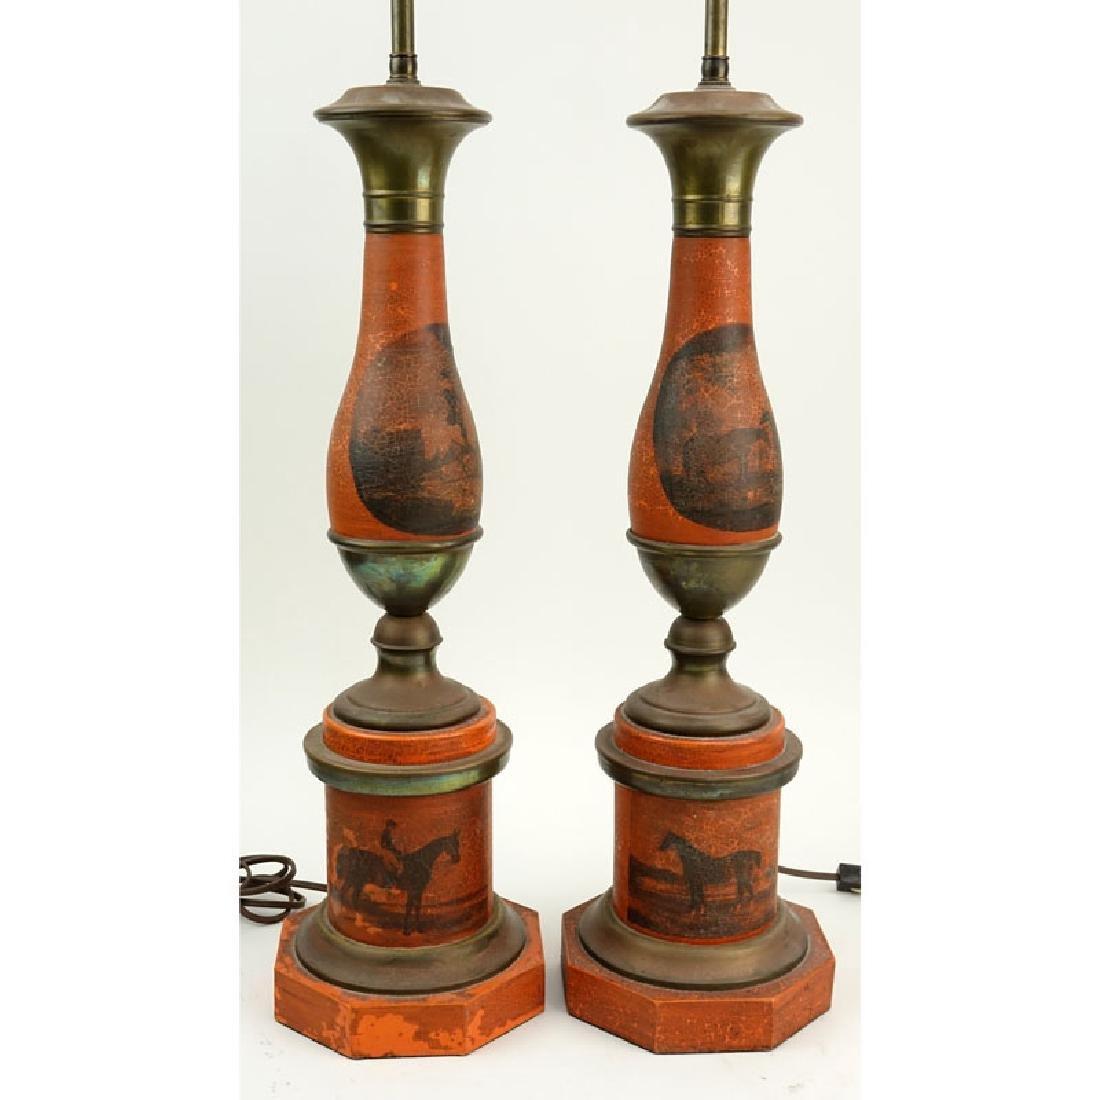 Pair of Vintage Tole Lamps. Horses motif. Unsigned.